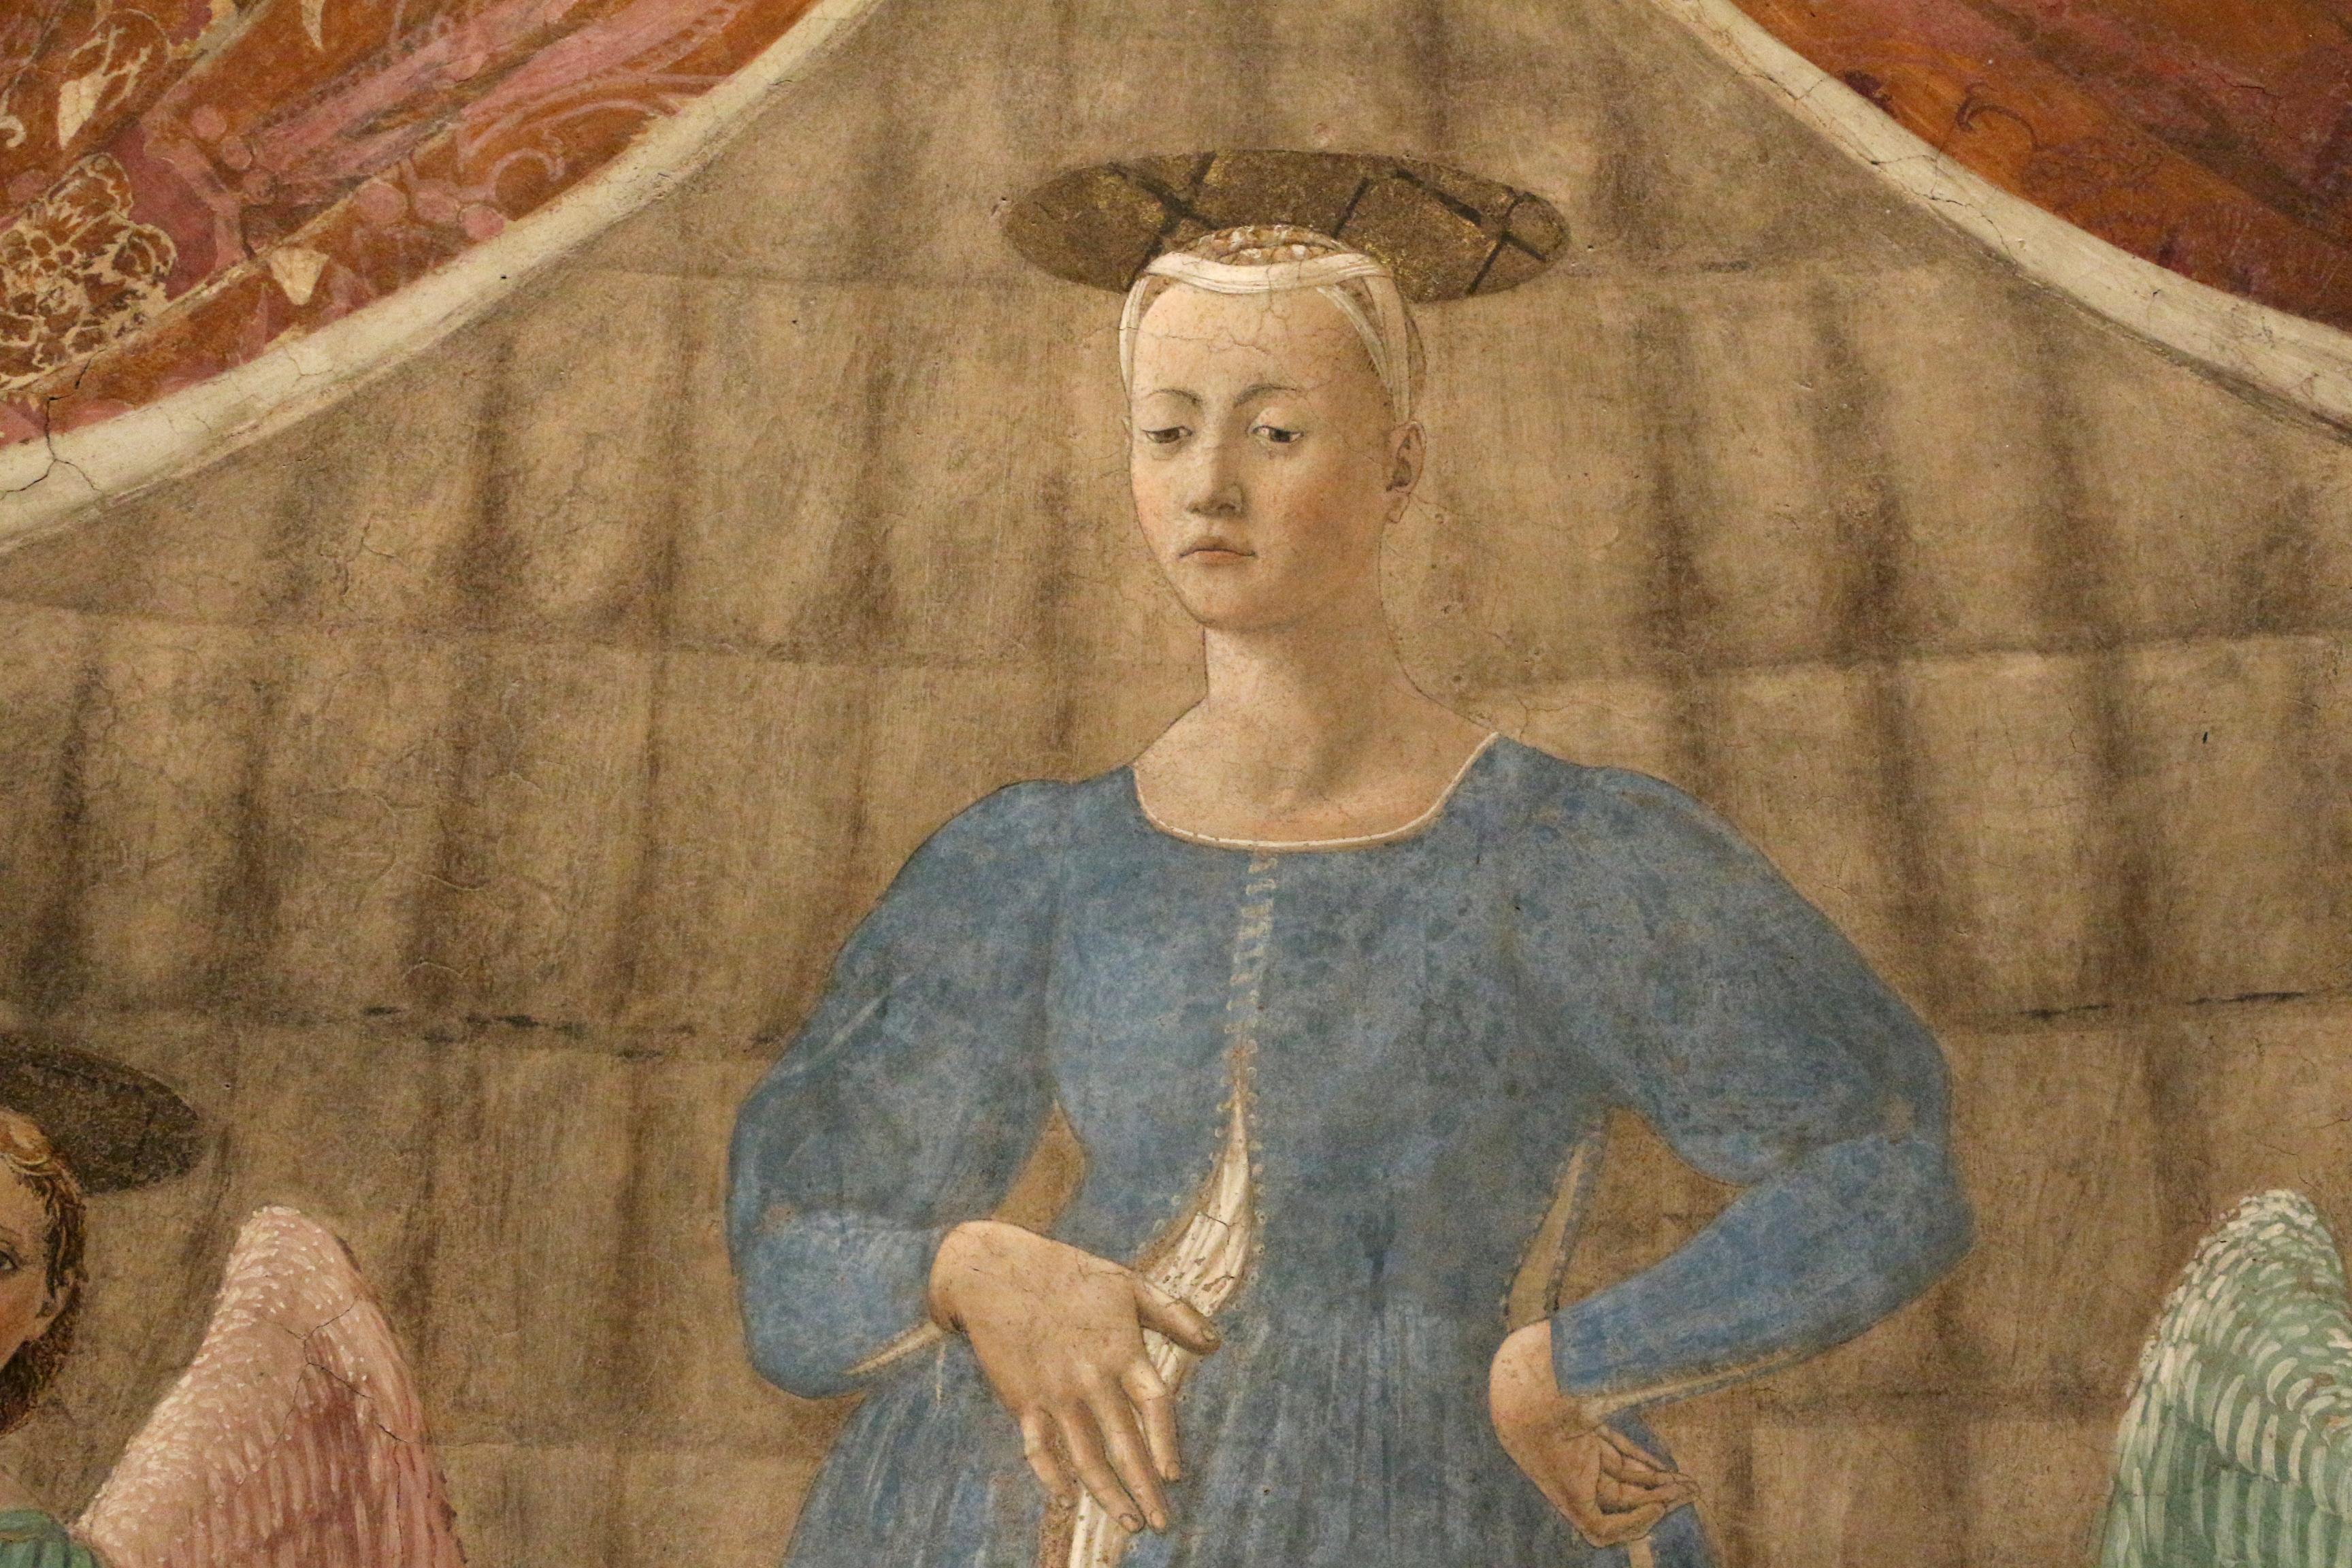 piero della francesca and the use Piero della francesca (italian pronunciation: [ˈpjɛːro della franˈtʃeska] listen (help info) c 1415 - 12 october 1492) was an italian painter of the early renaissance.